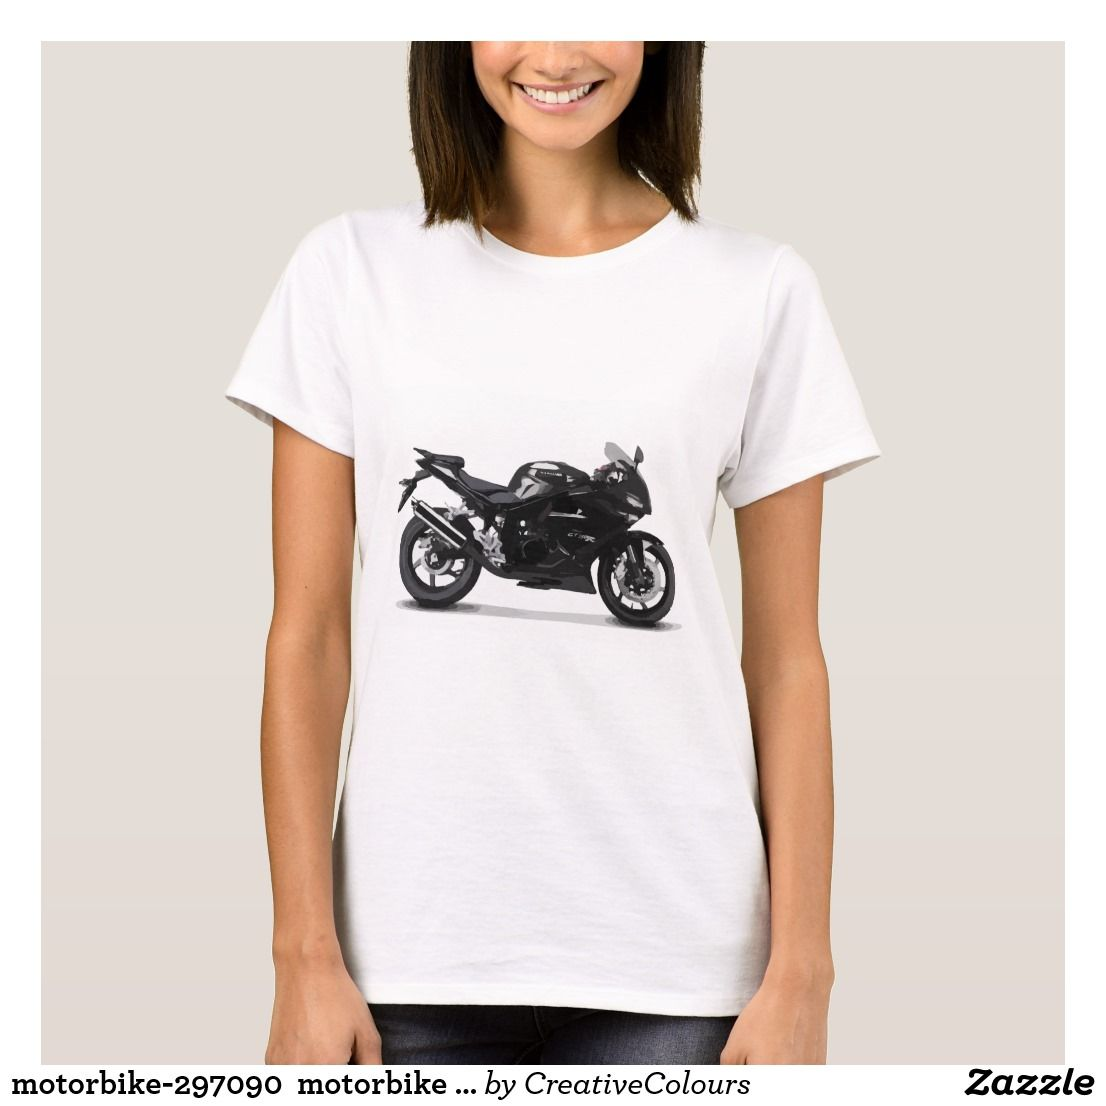 motorbike-297090  motorbike motorcycle bike race r T-Shirt | Zazzle.com